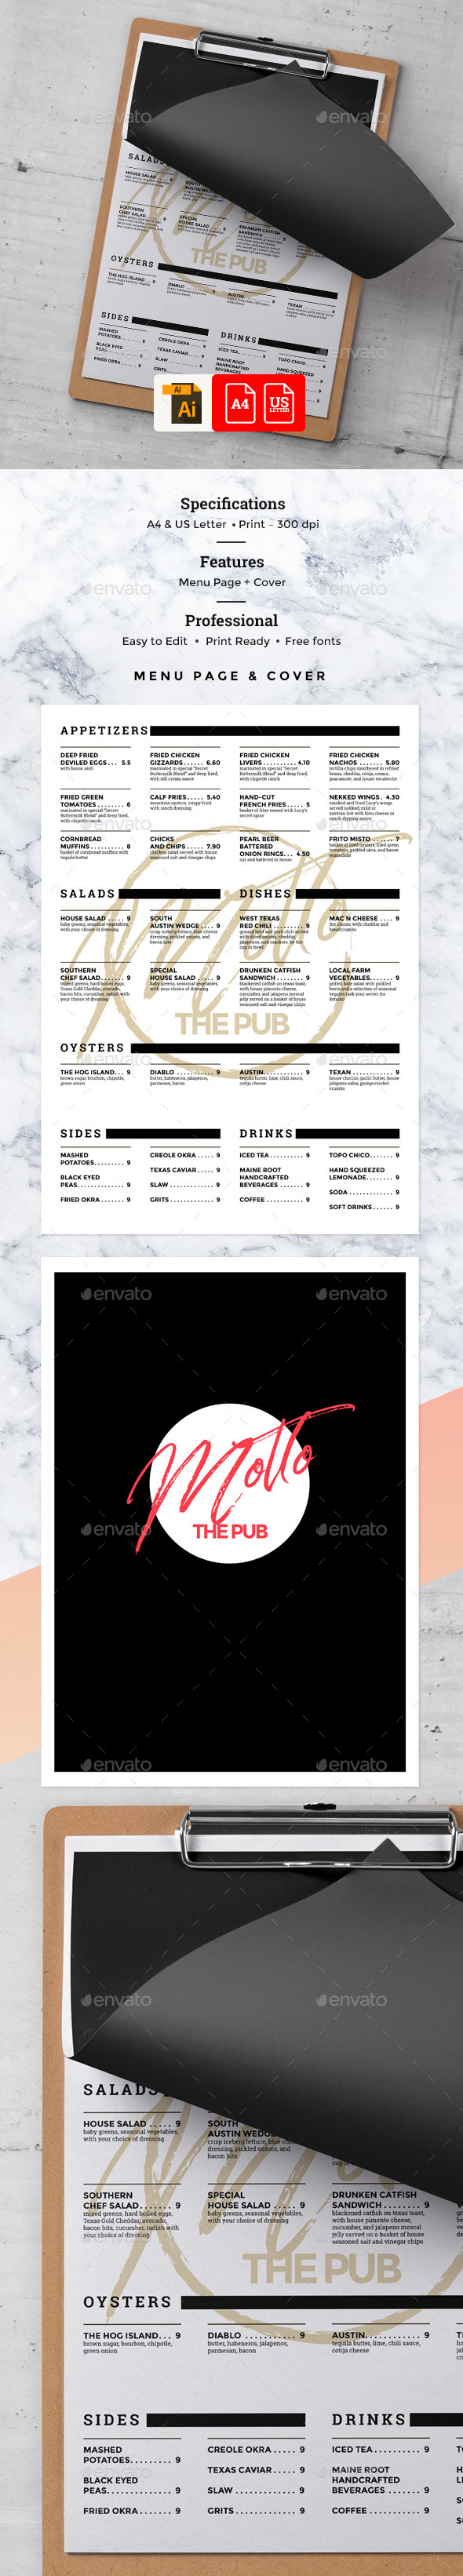 Cafe Food Menu - Food Menus Print Templates